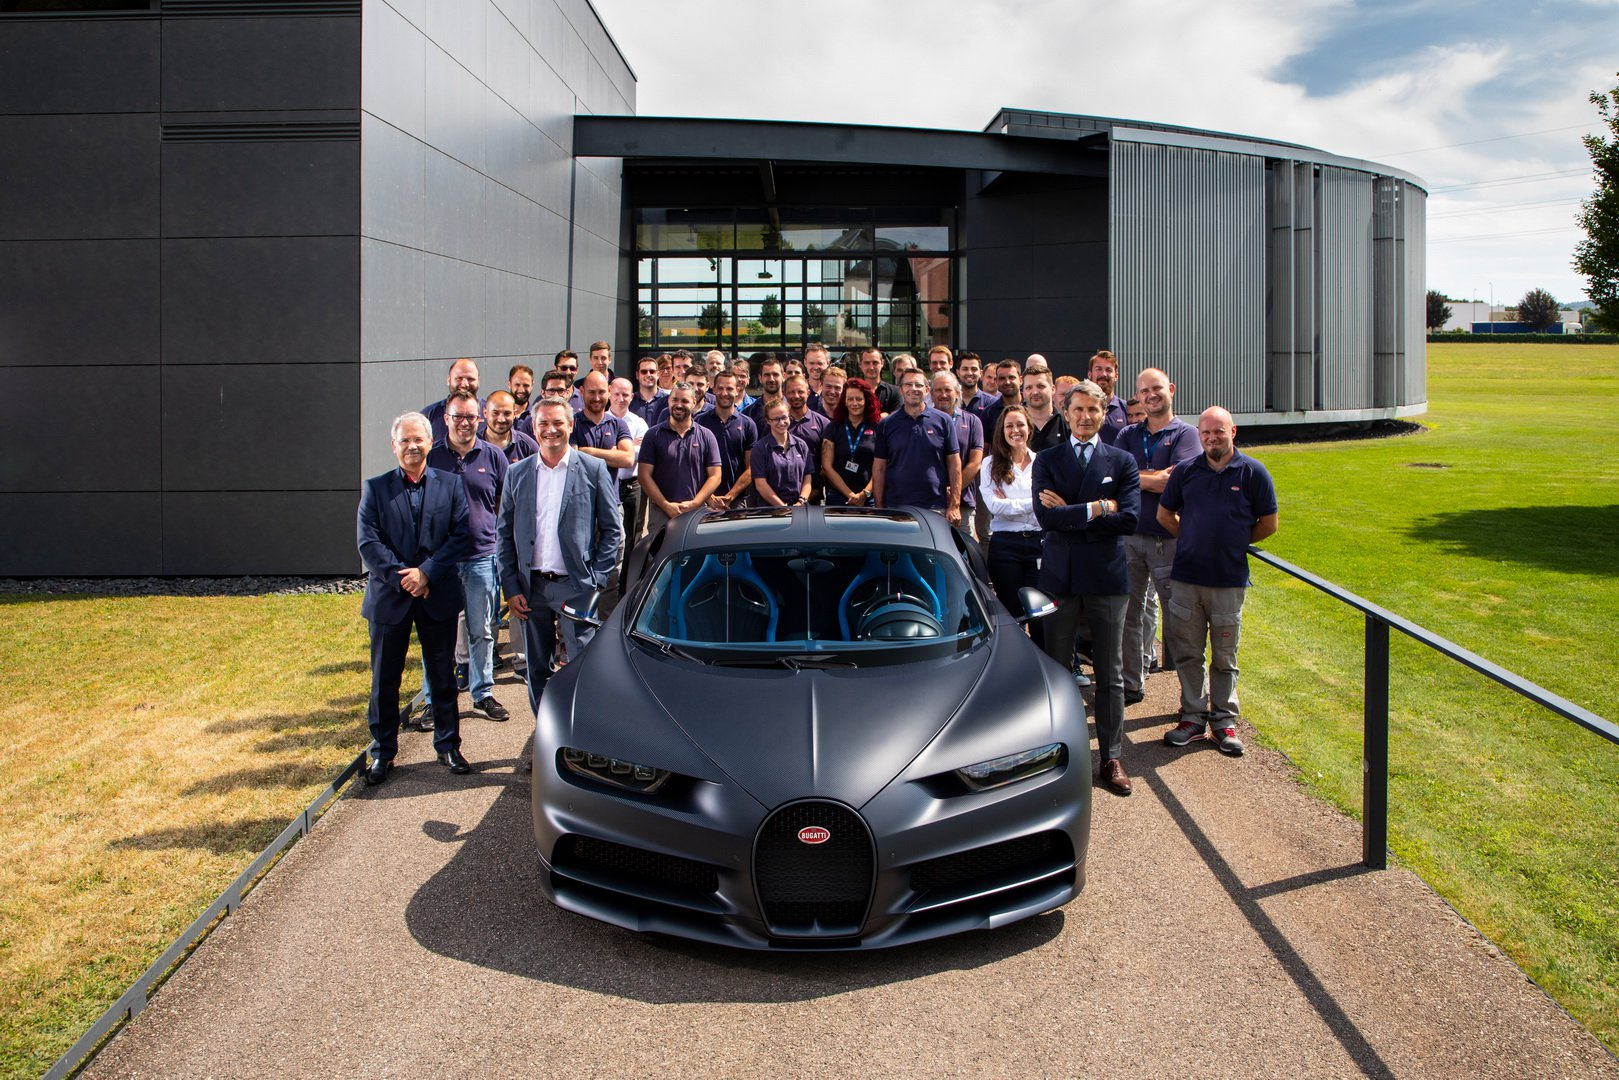 Bugatti-Chiron-Sport-110-Ans-Bugatti-production-plant-38